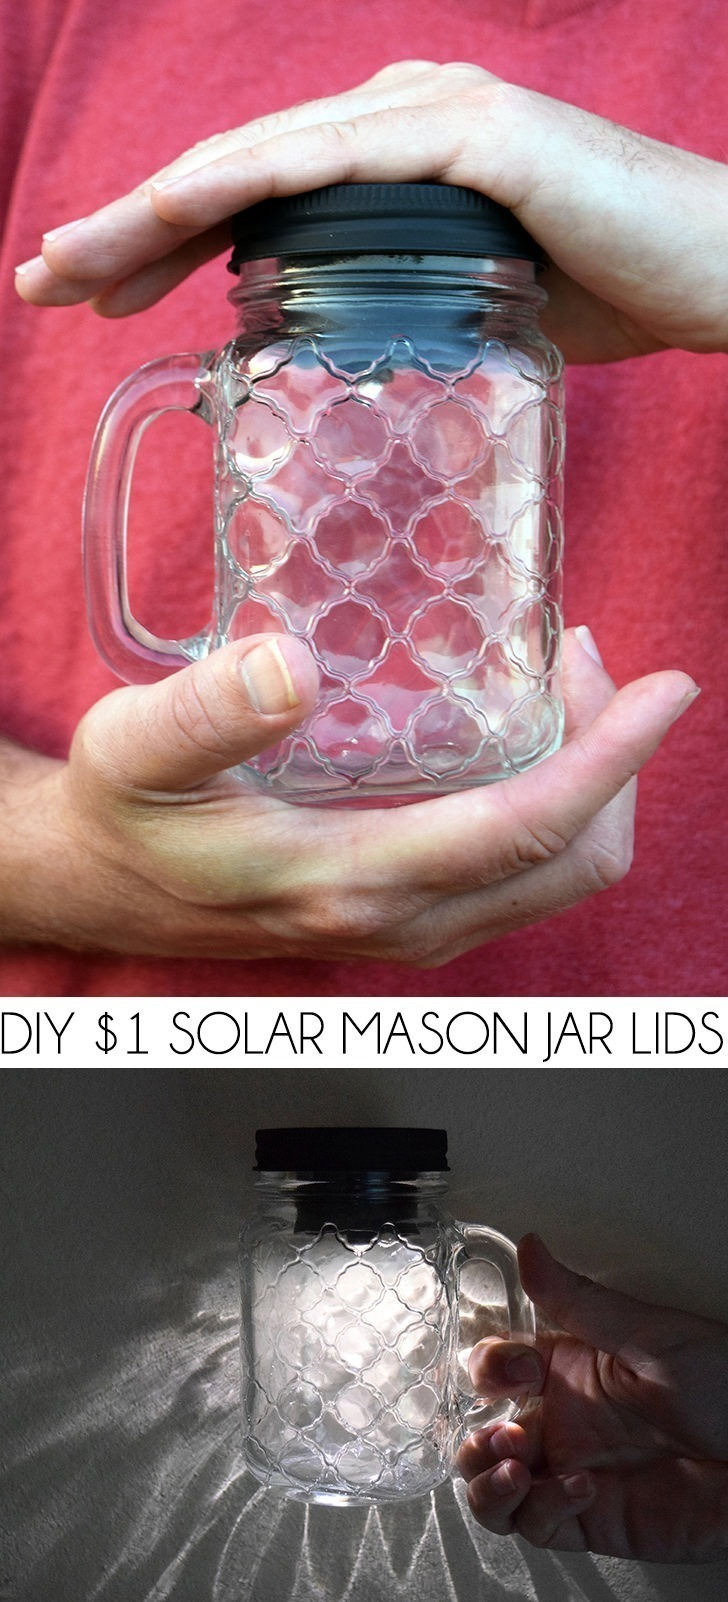 Solar Mason Jar Lids